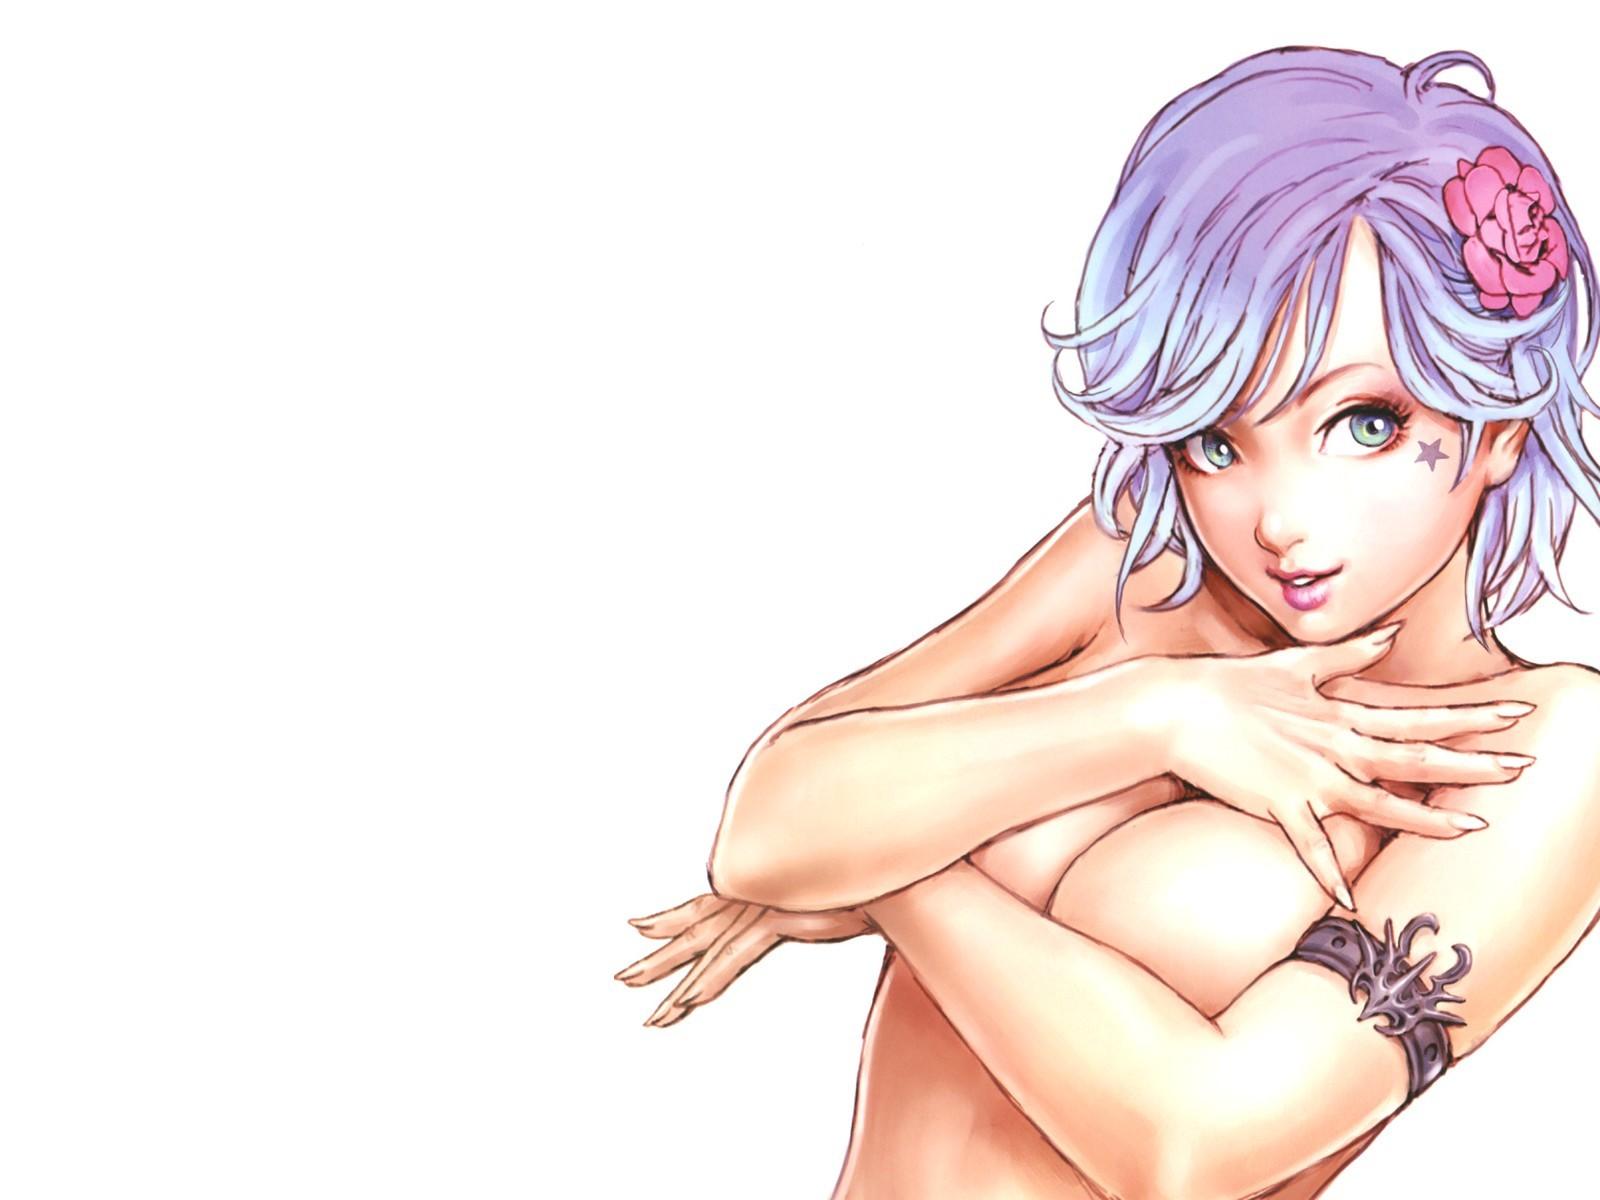 Sex manga elfe nackt hardcore realistic woman